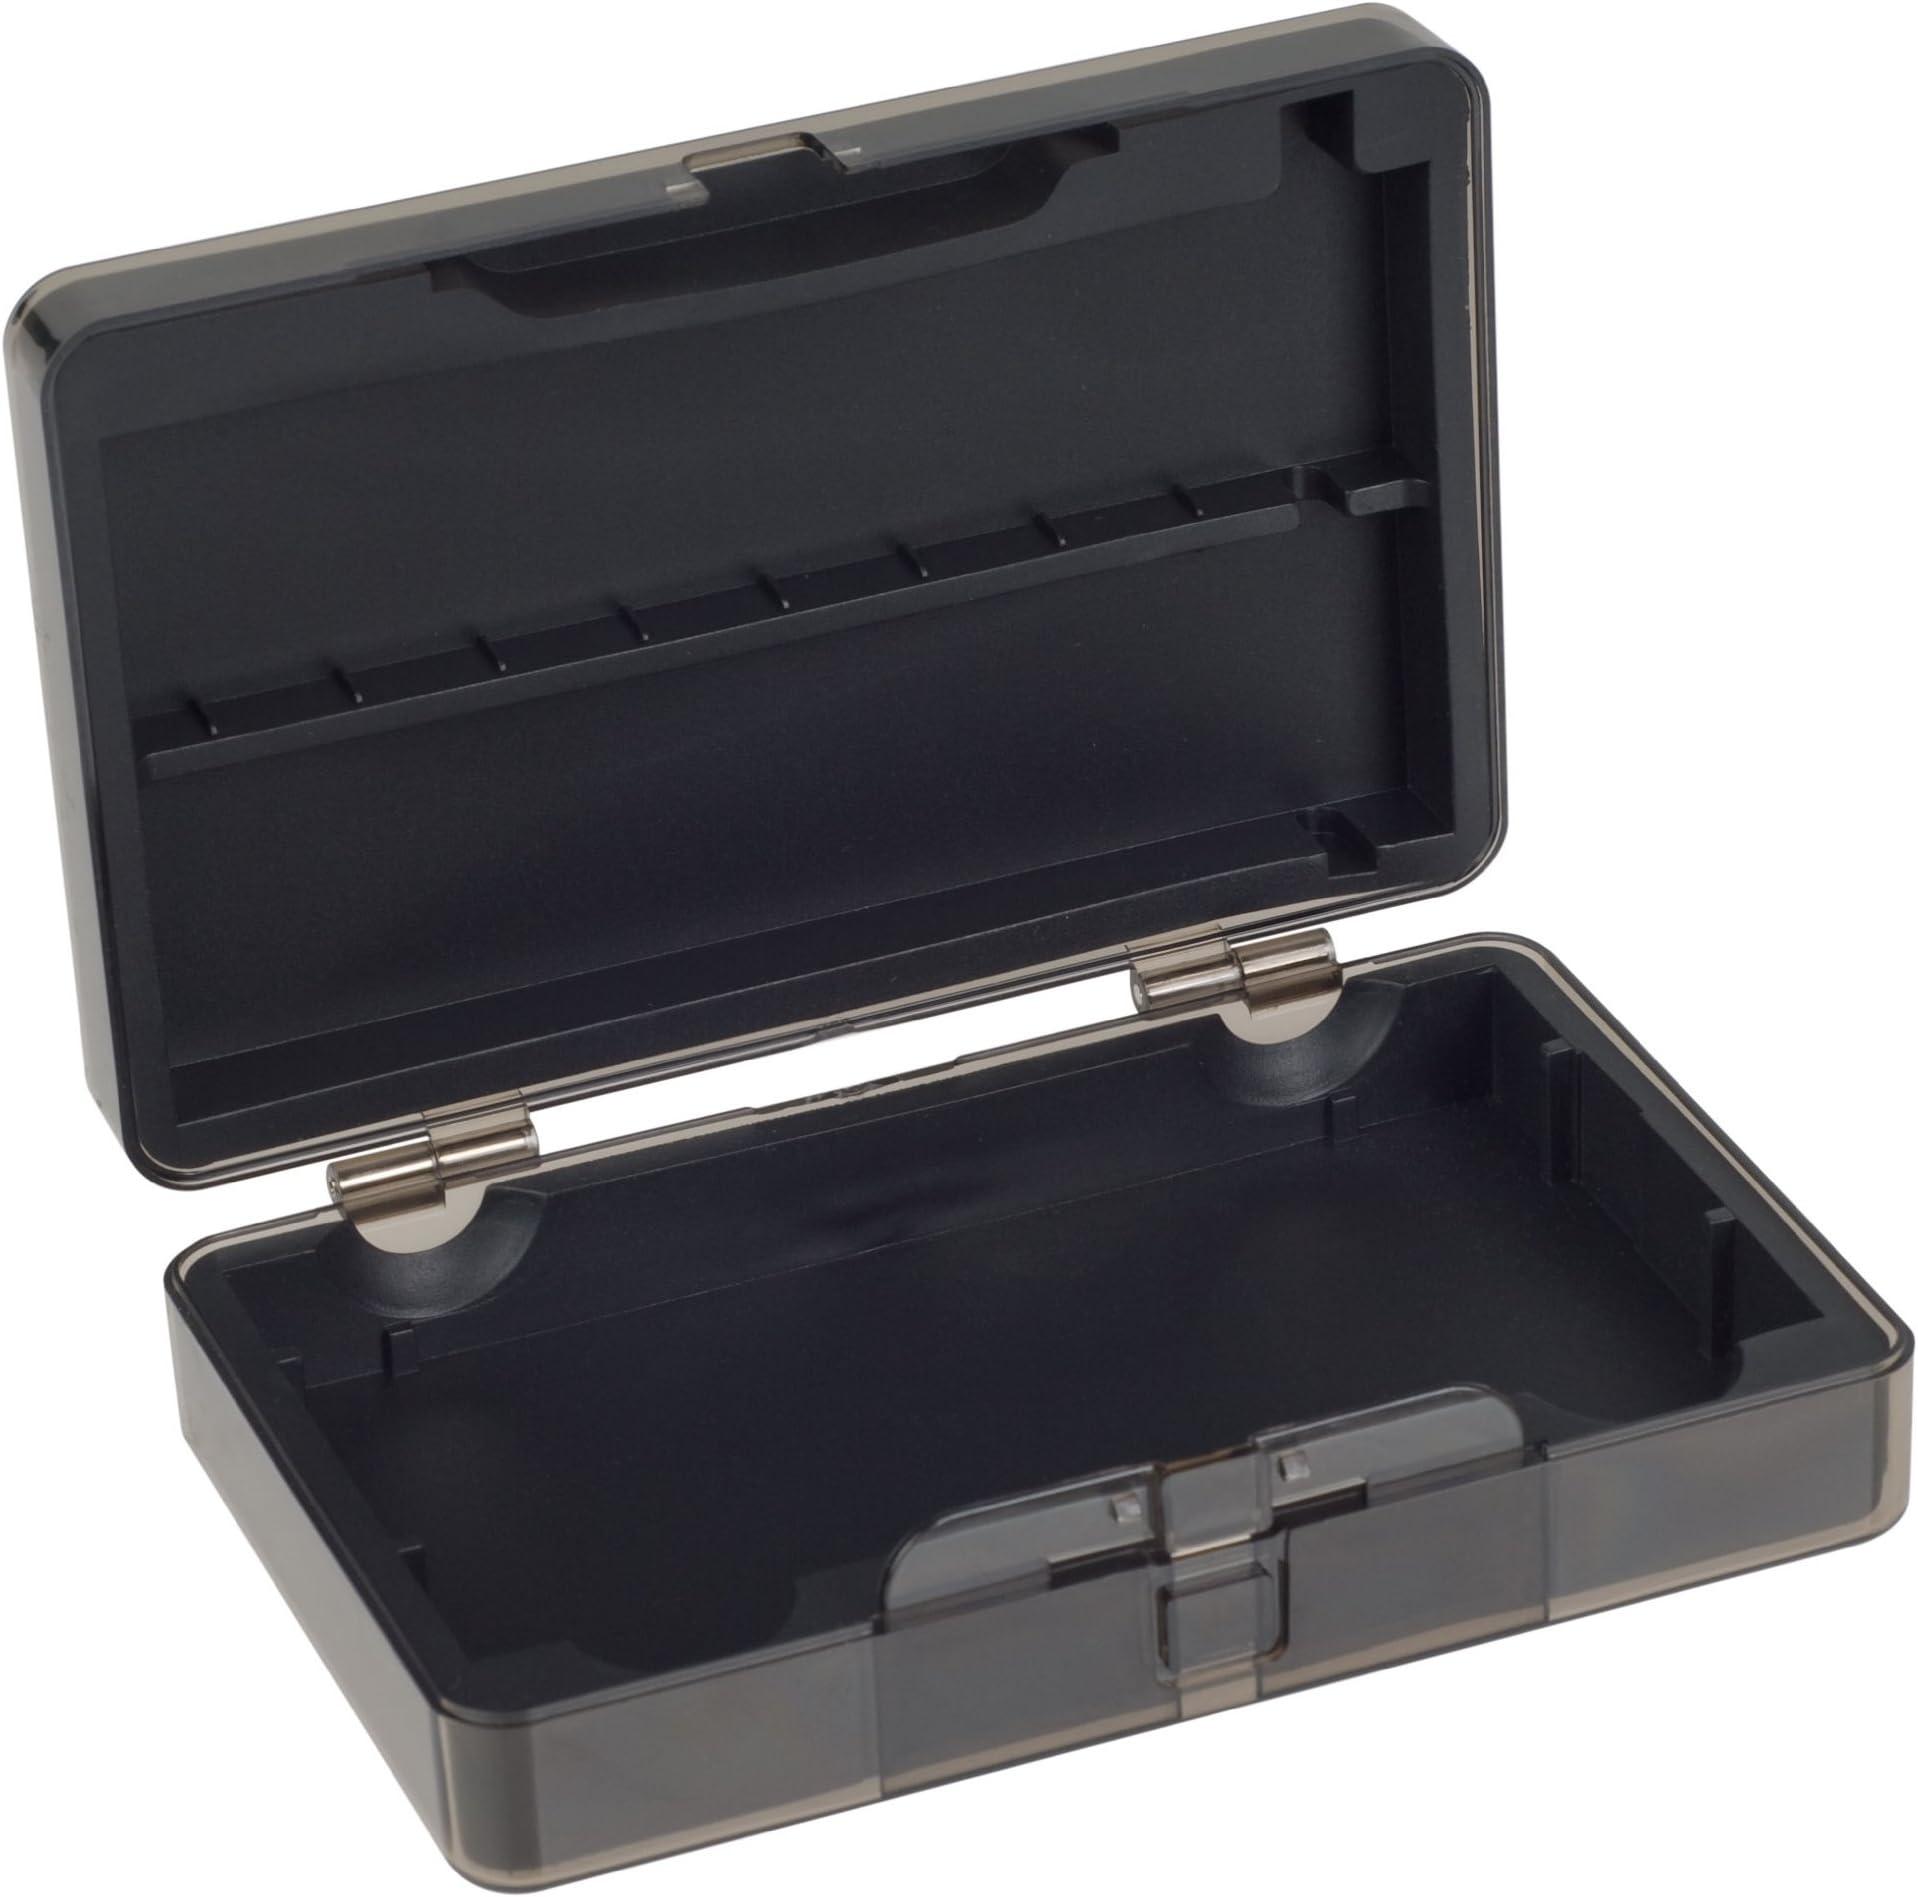 Amazon.com: Nintendo DS Lite Traveler - Black: Video Games